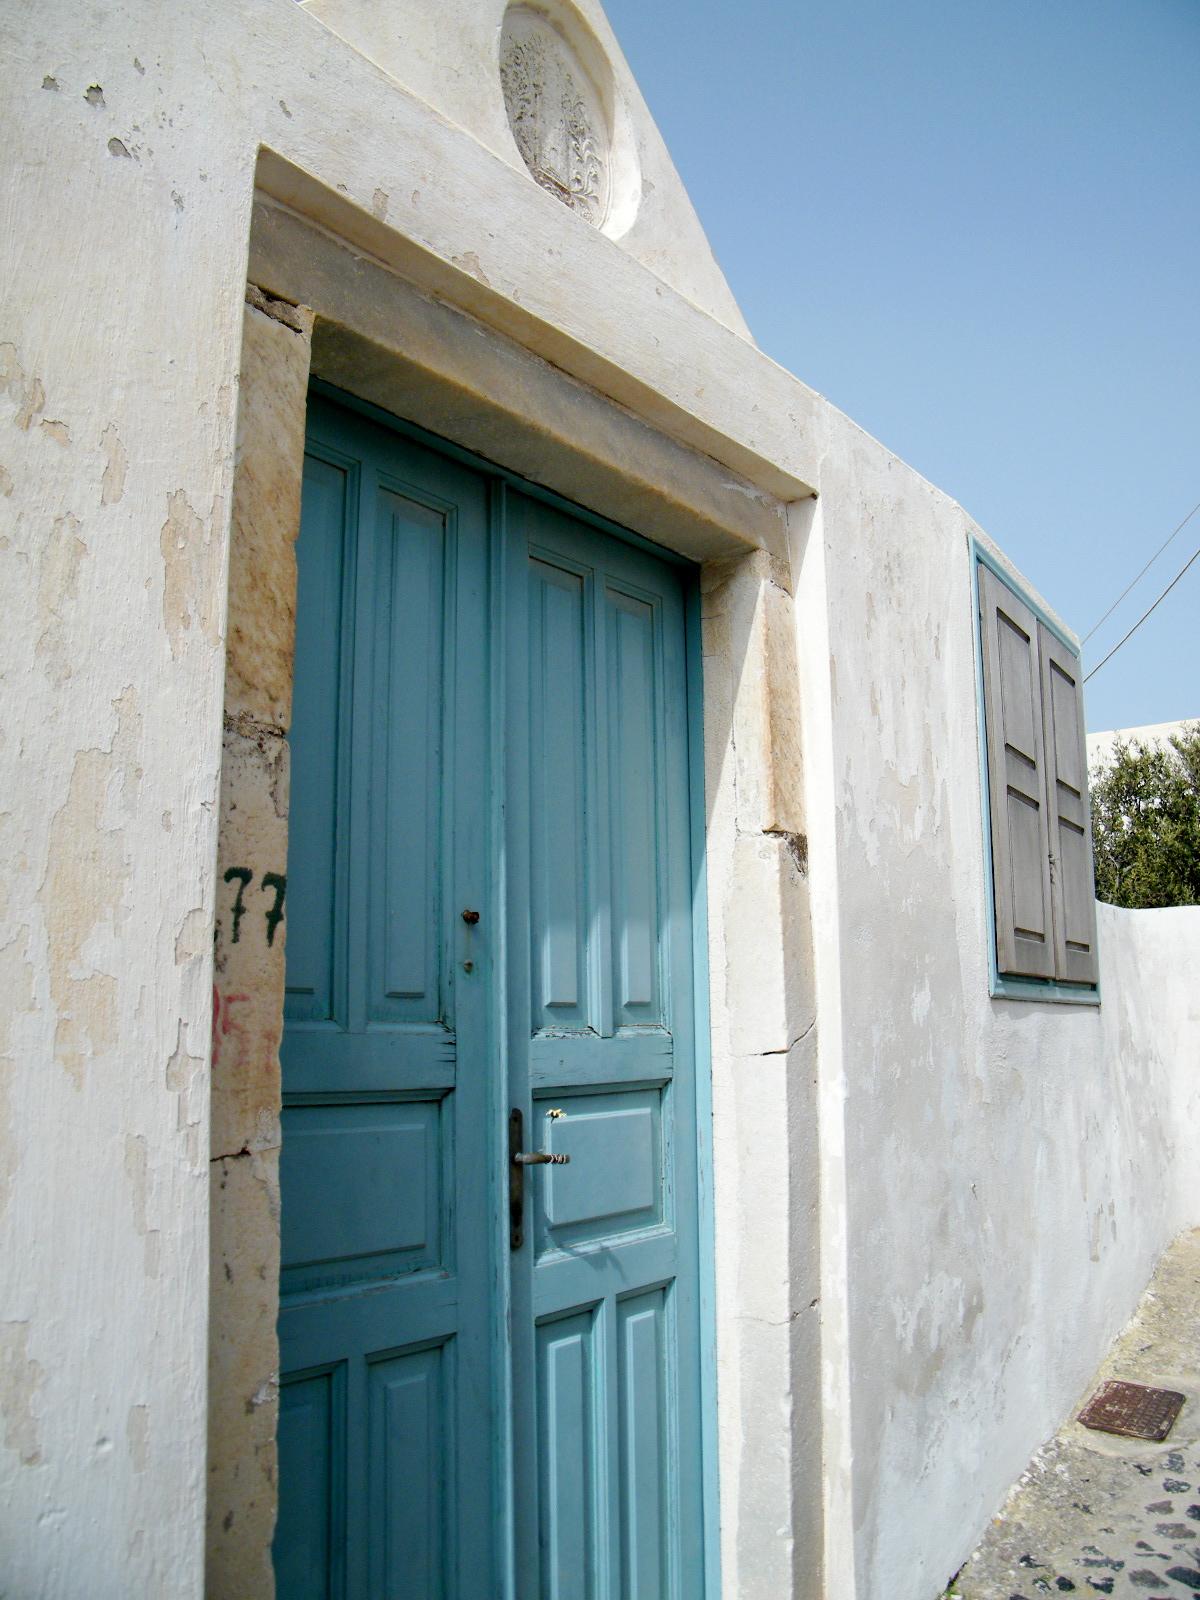 Greek Architecture, Architecture, Door, Greece, Greek, HQ Photo